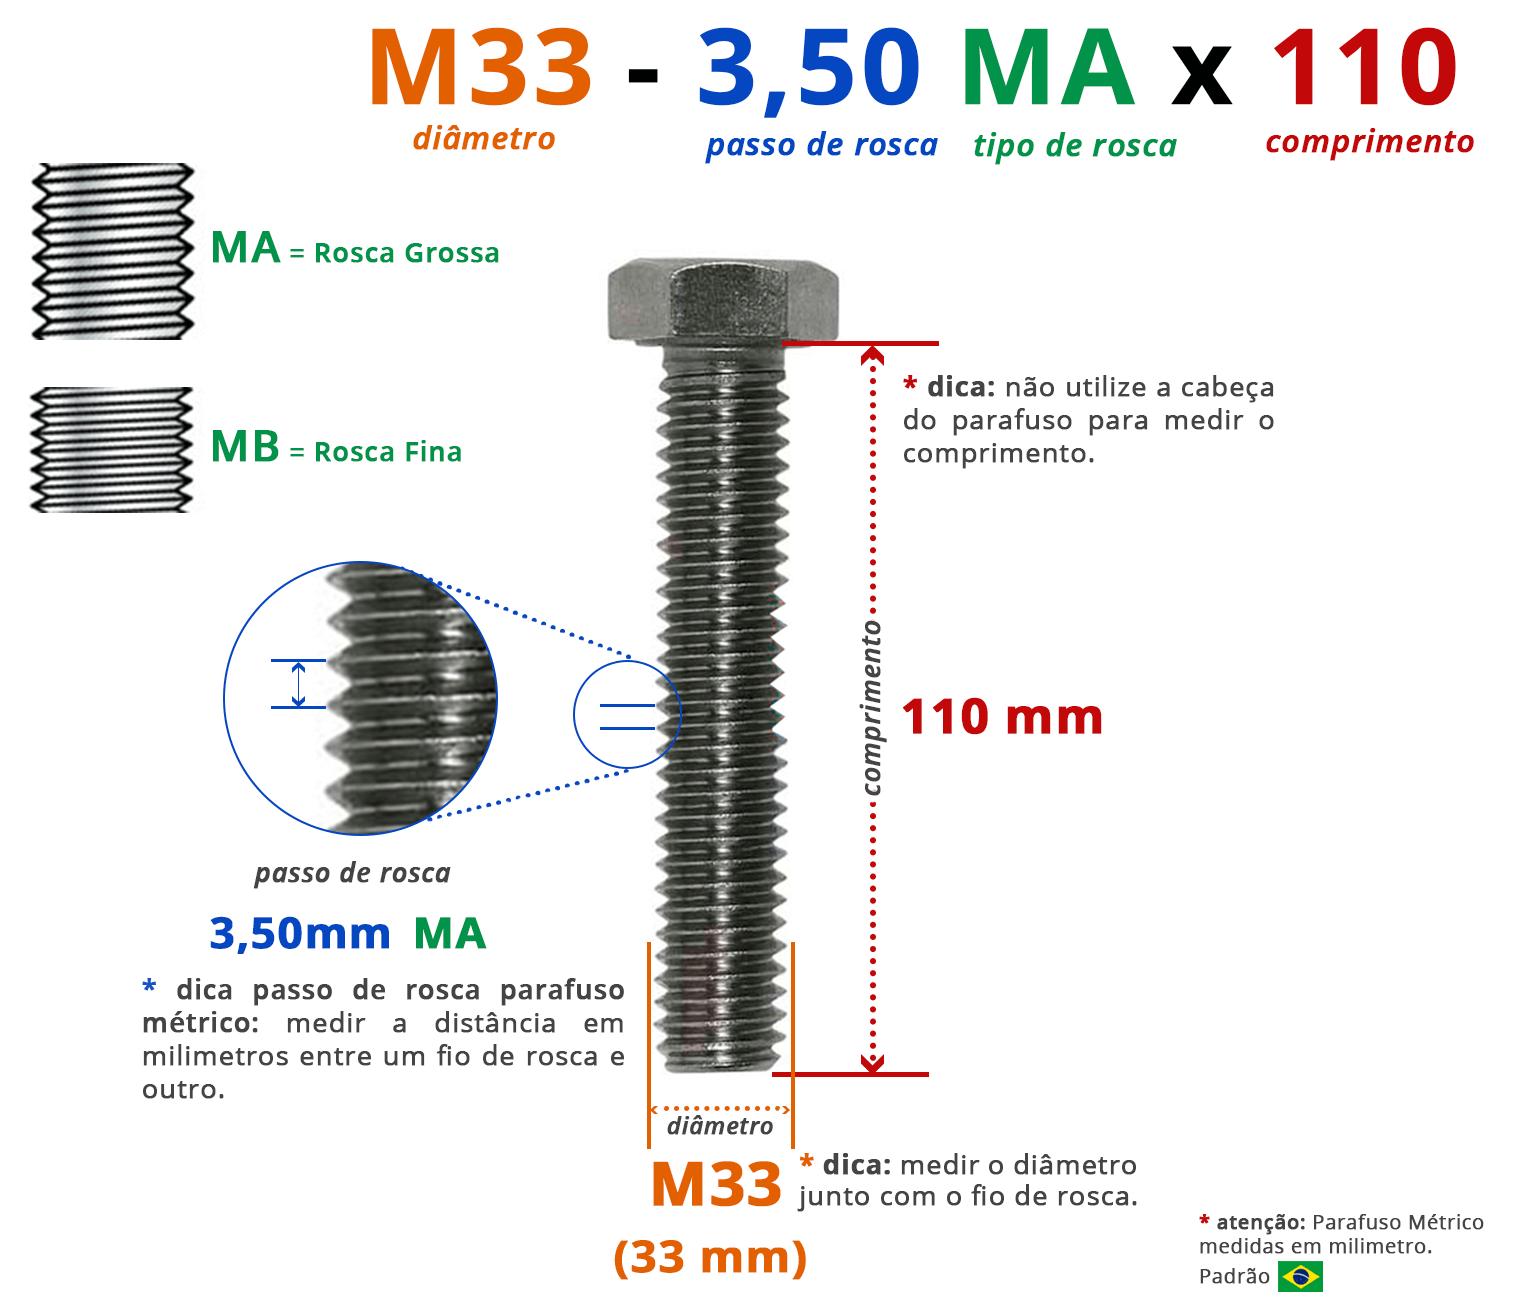 PARAFUSO SEXTAVADO ROSCA INTEIRA M33 3,50 MA X 110 DIN 933 INOX A4